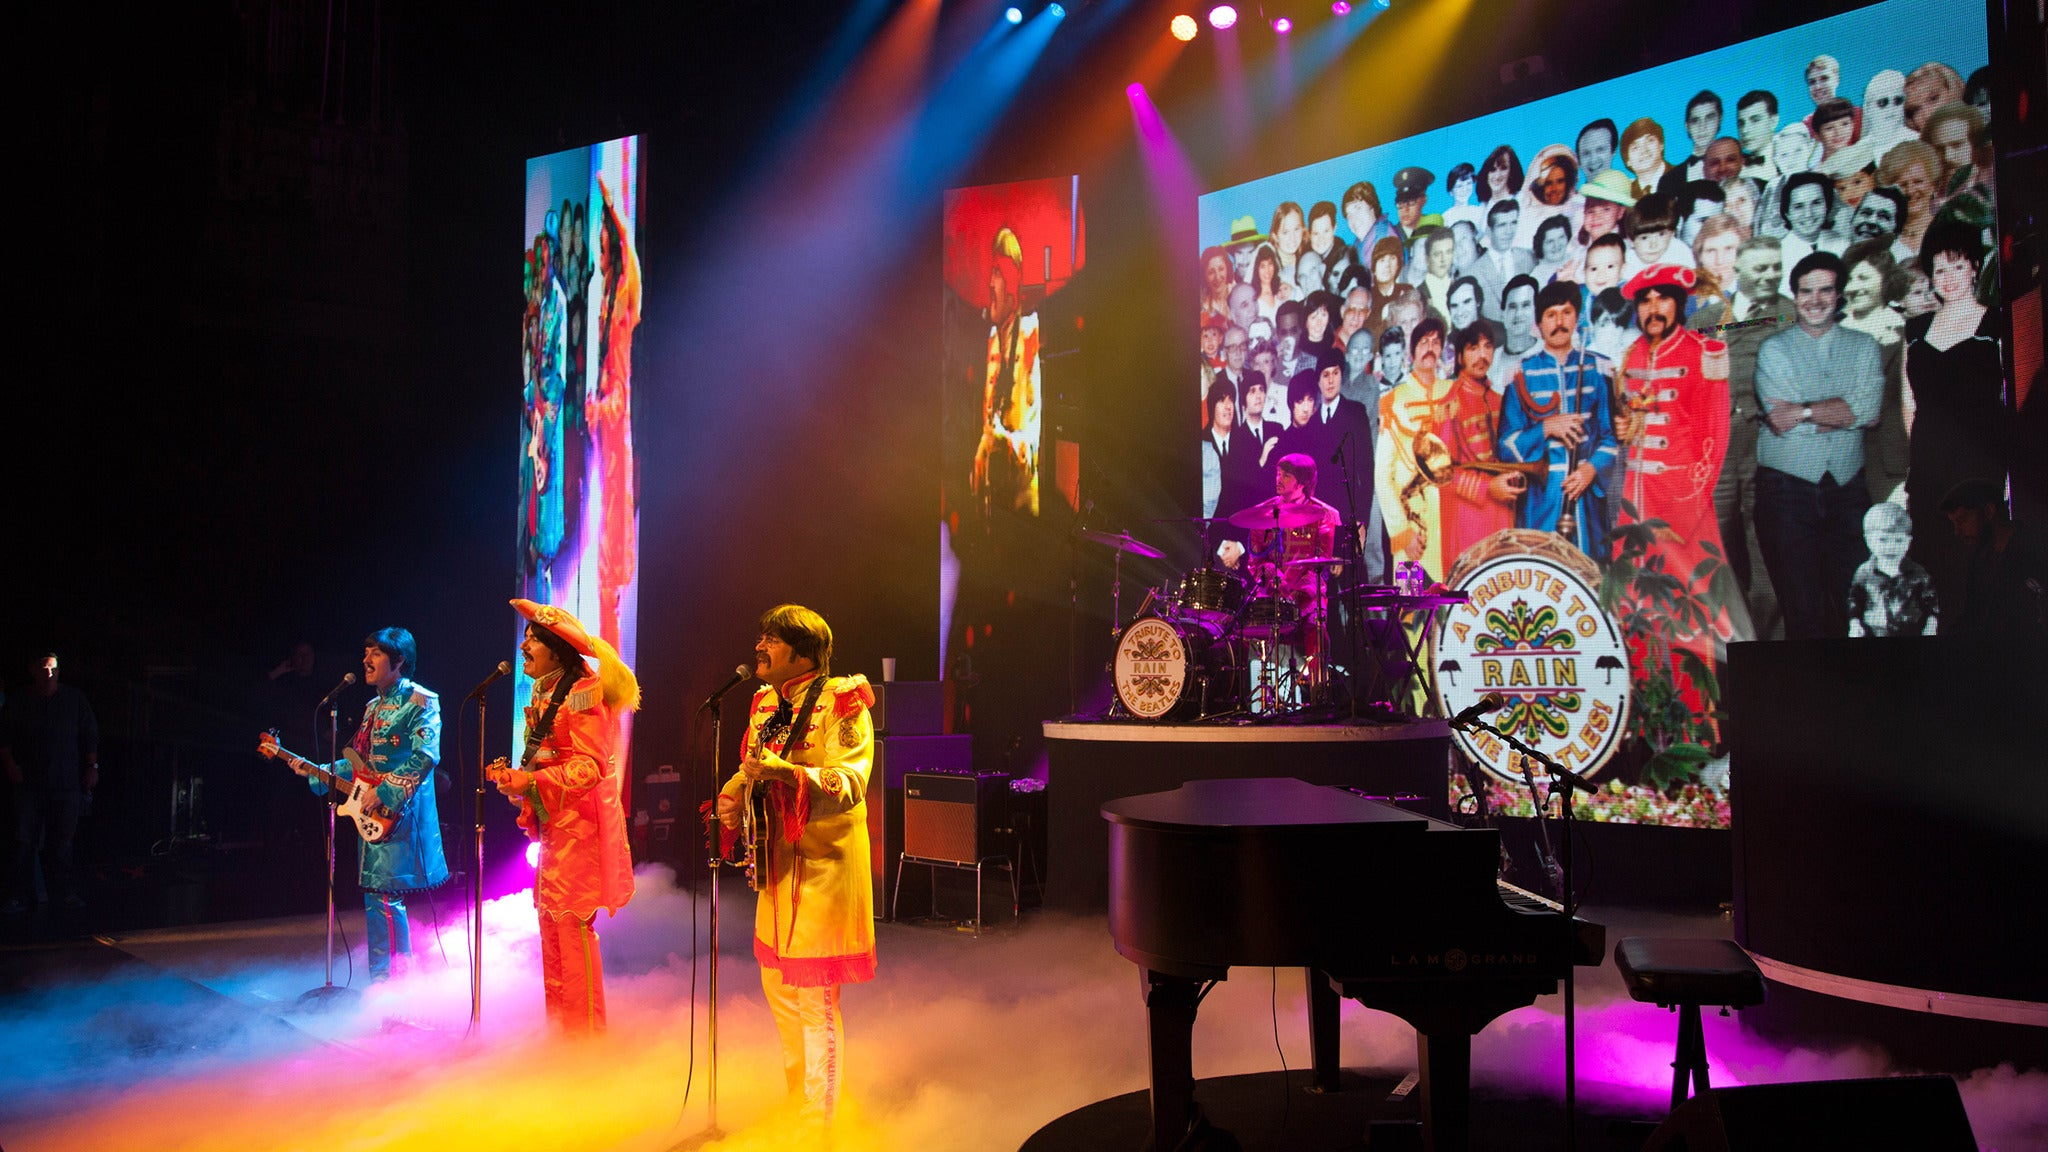 Rain: a Tribute To the Beatles at Adler Theatre - Davenport, IA 52801